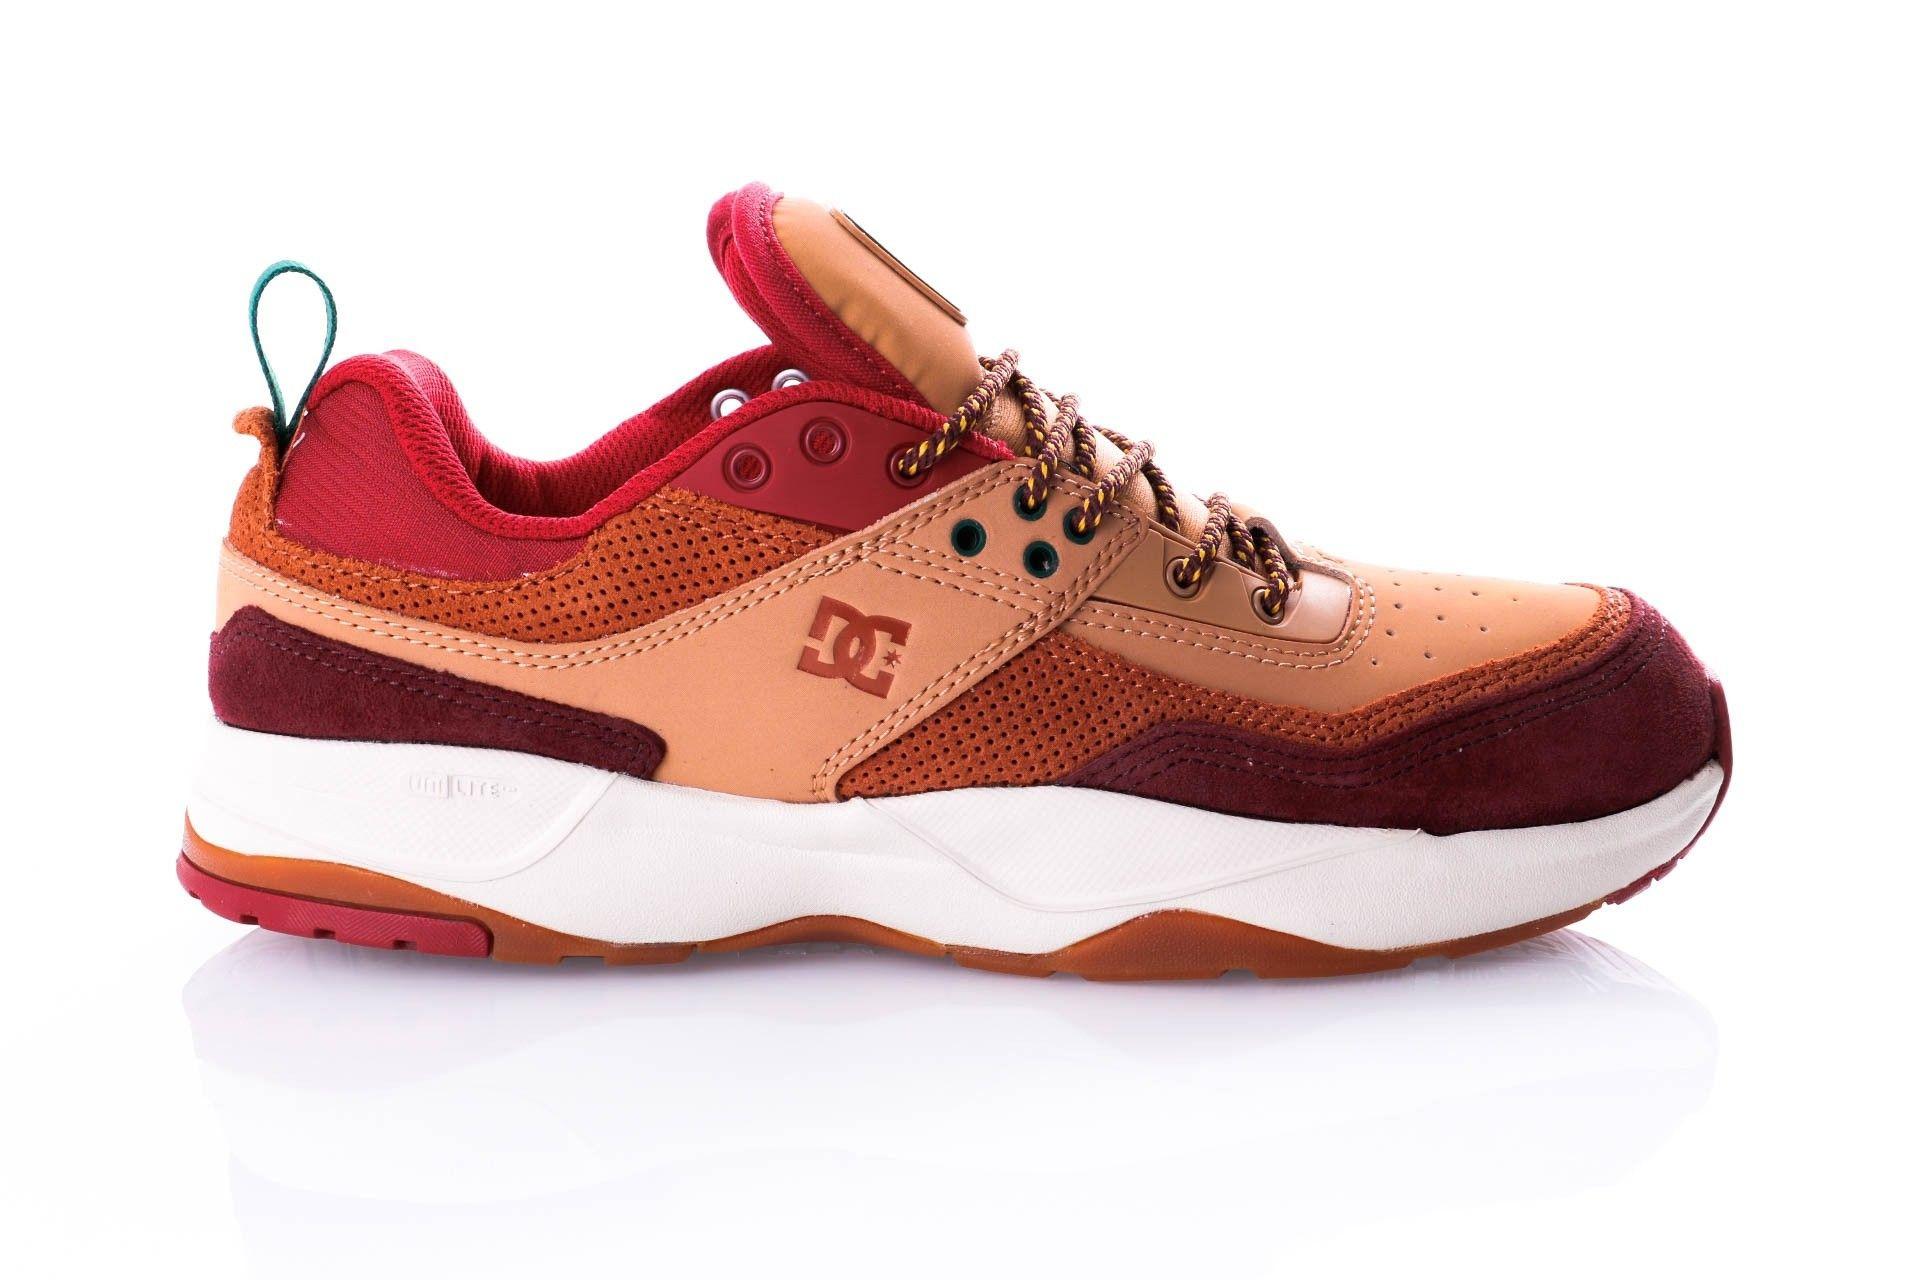 Afbeelding van Dc E.Tribeka Se M Shoe Bt3 Adys700142-Bt3 Sneakers Burgundy/Tan